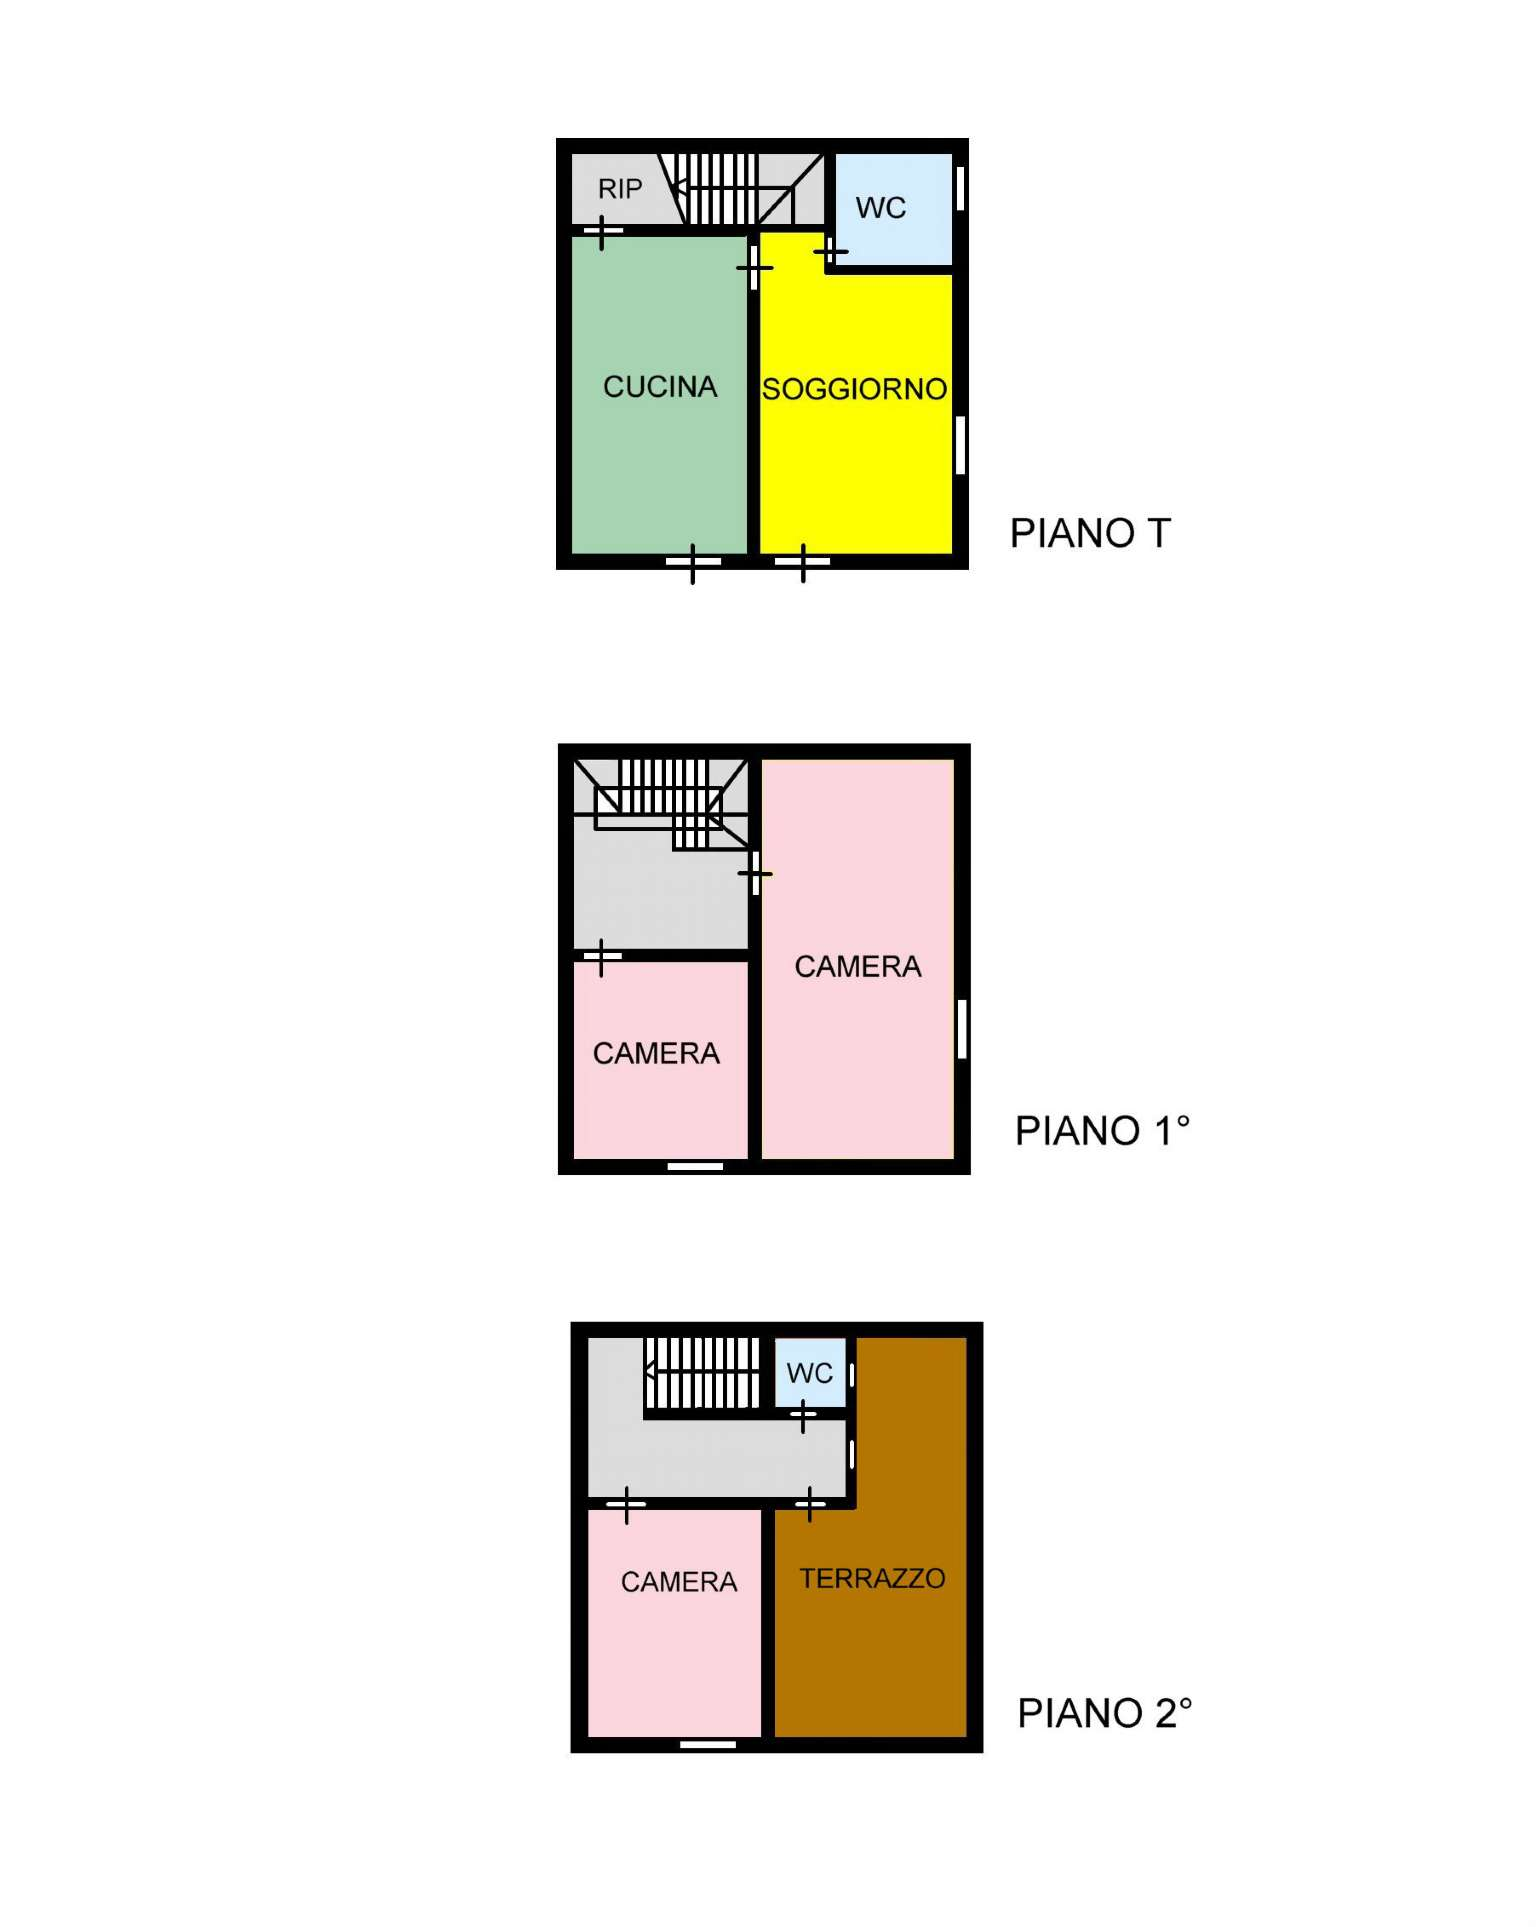 Casa indipendente in Vendita a Ustica: 5 locali, 90 mq